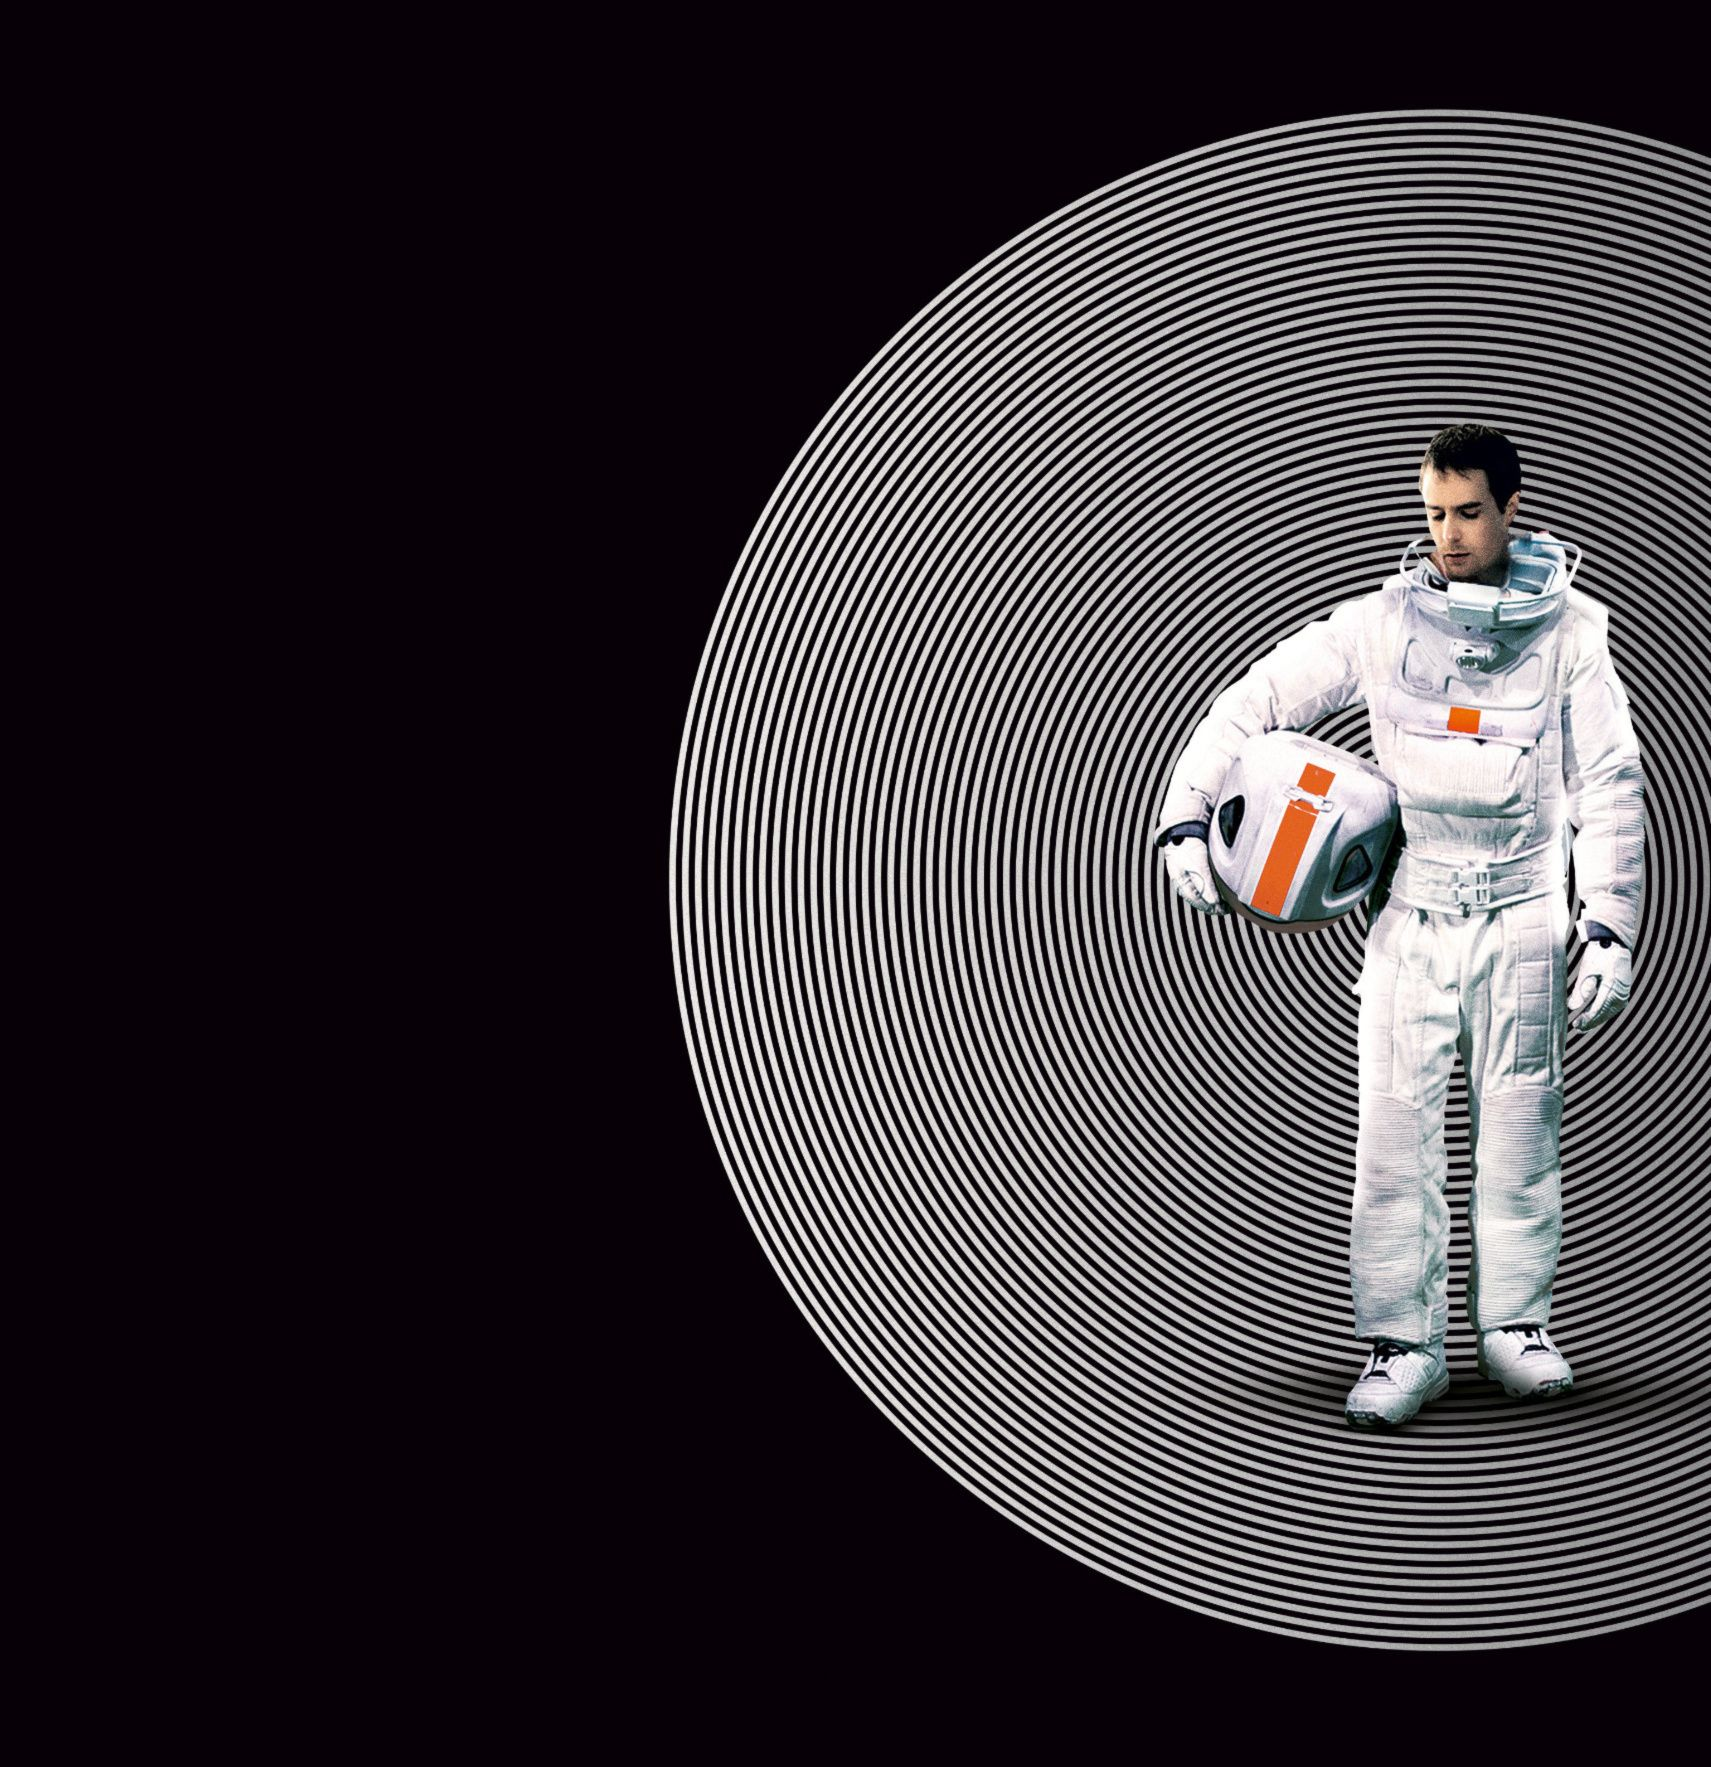 Moonbase Alpha Moonbase Beta Sam Rockwell Is The Secret Vfx At The Heart Of Duncan Jones Moon Cinephilia Beyond